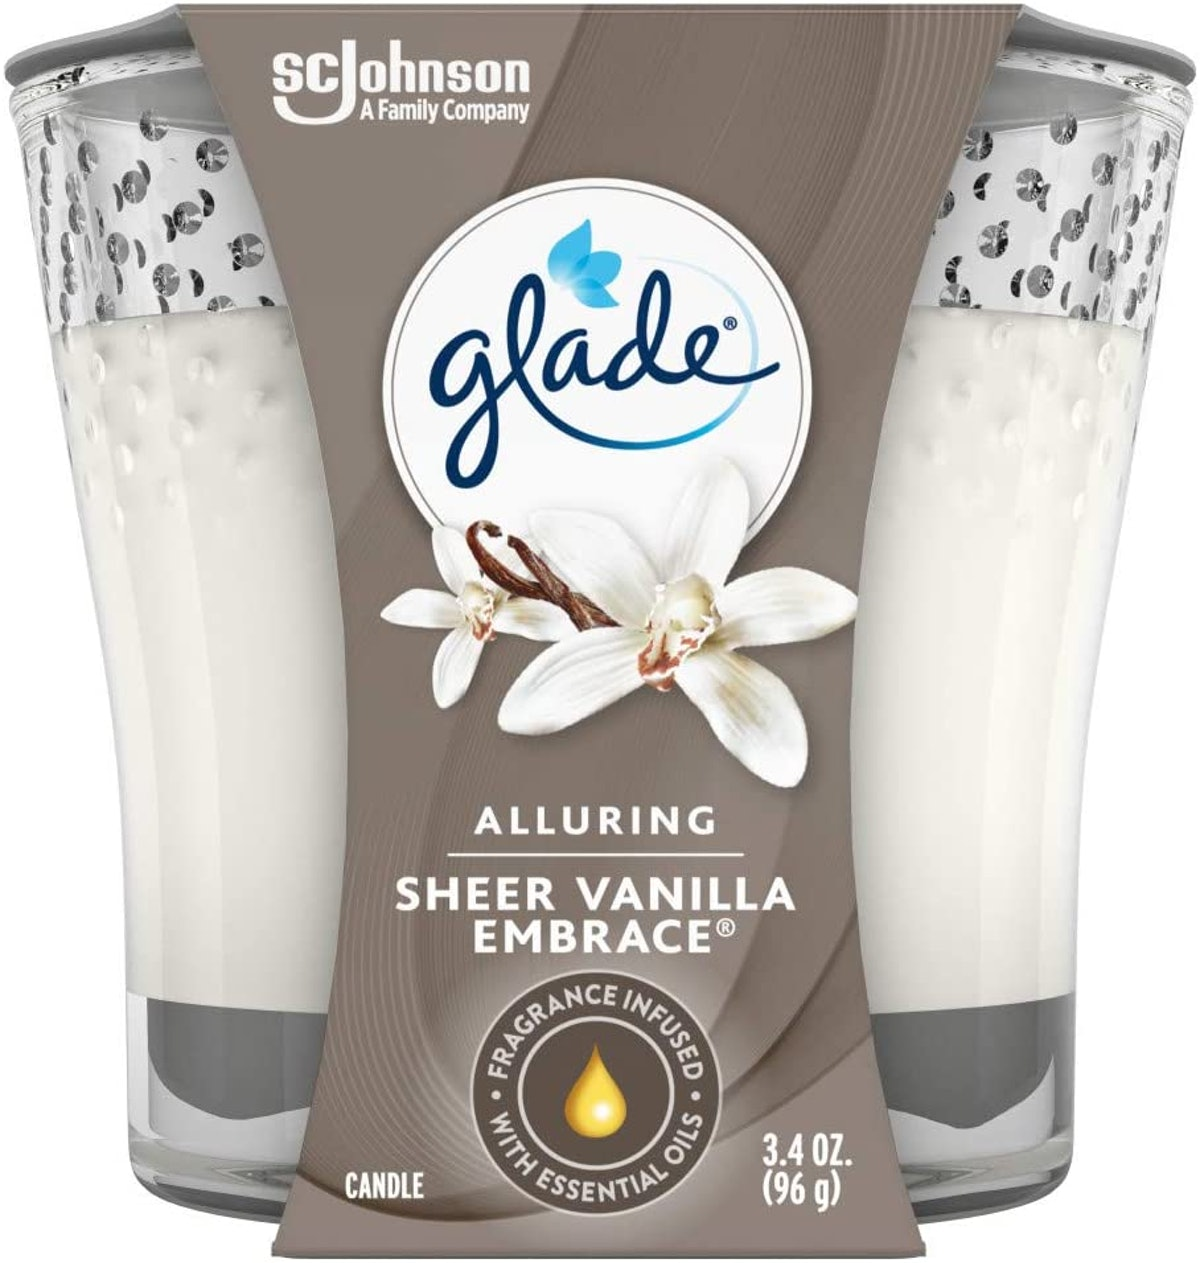 Glade Candle Jar, Sheer Vanilla Embrace, 3.4 Oz.